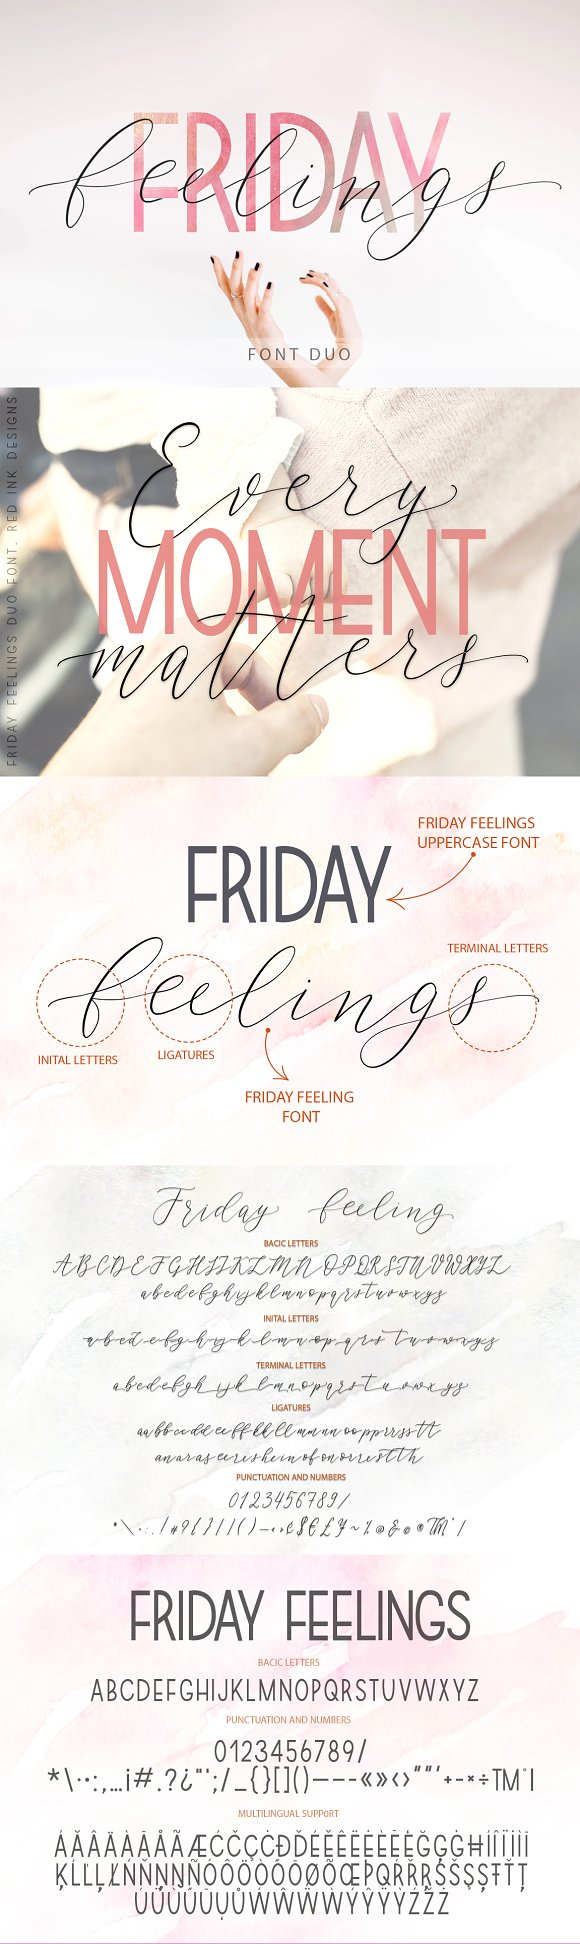 Friday Feelings Font Duo